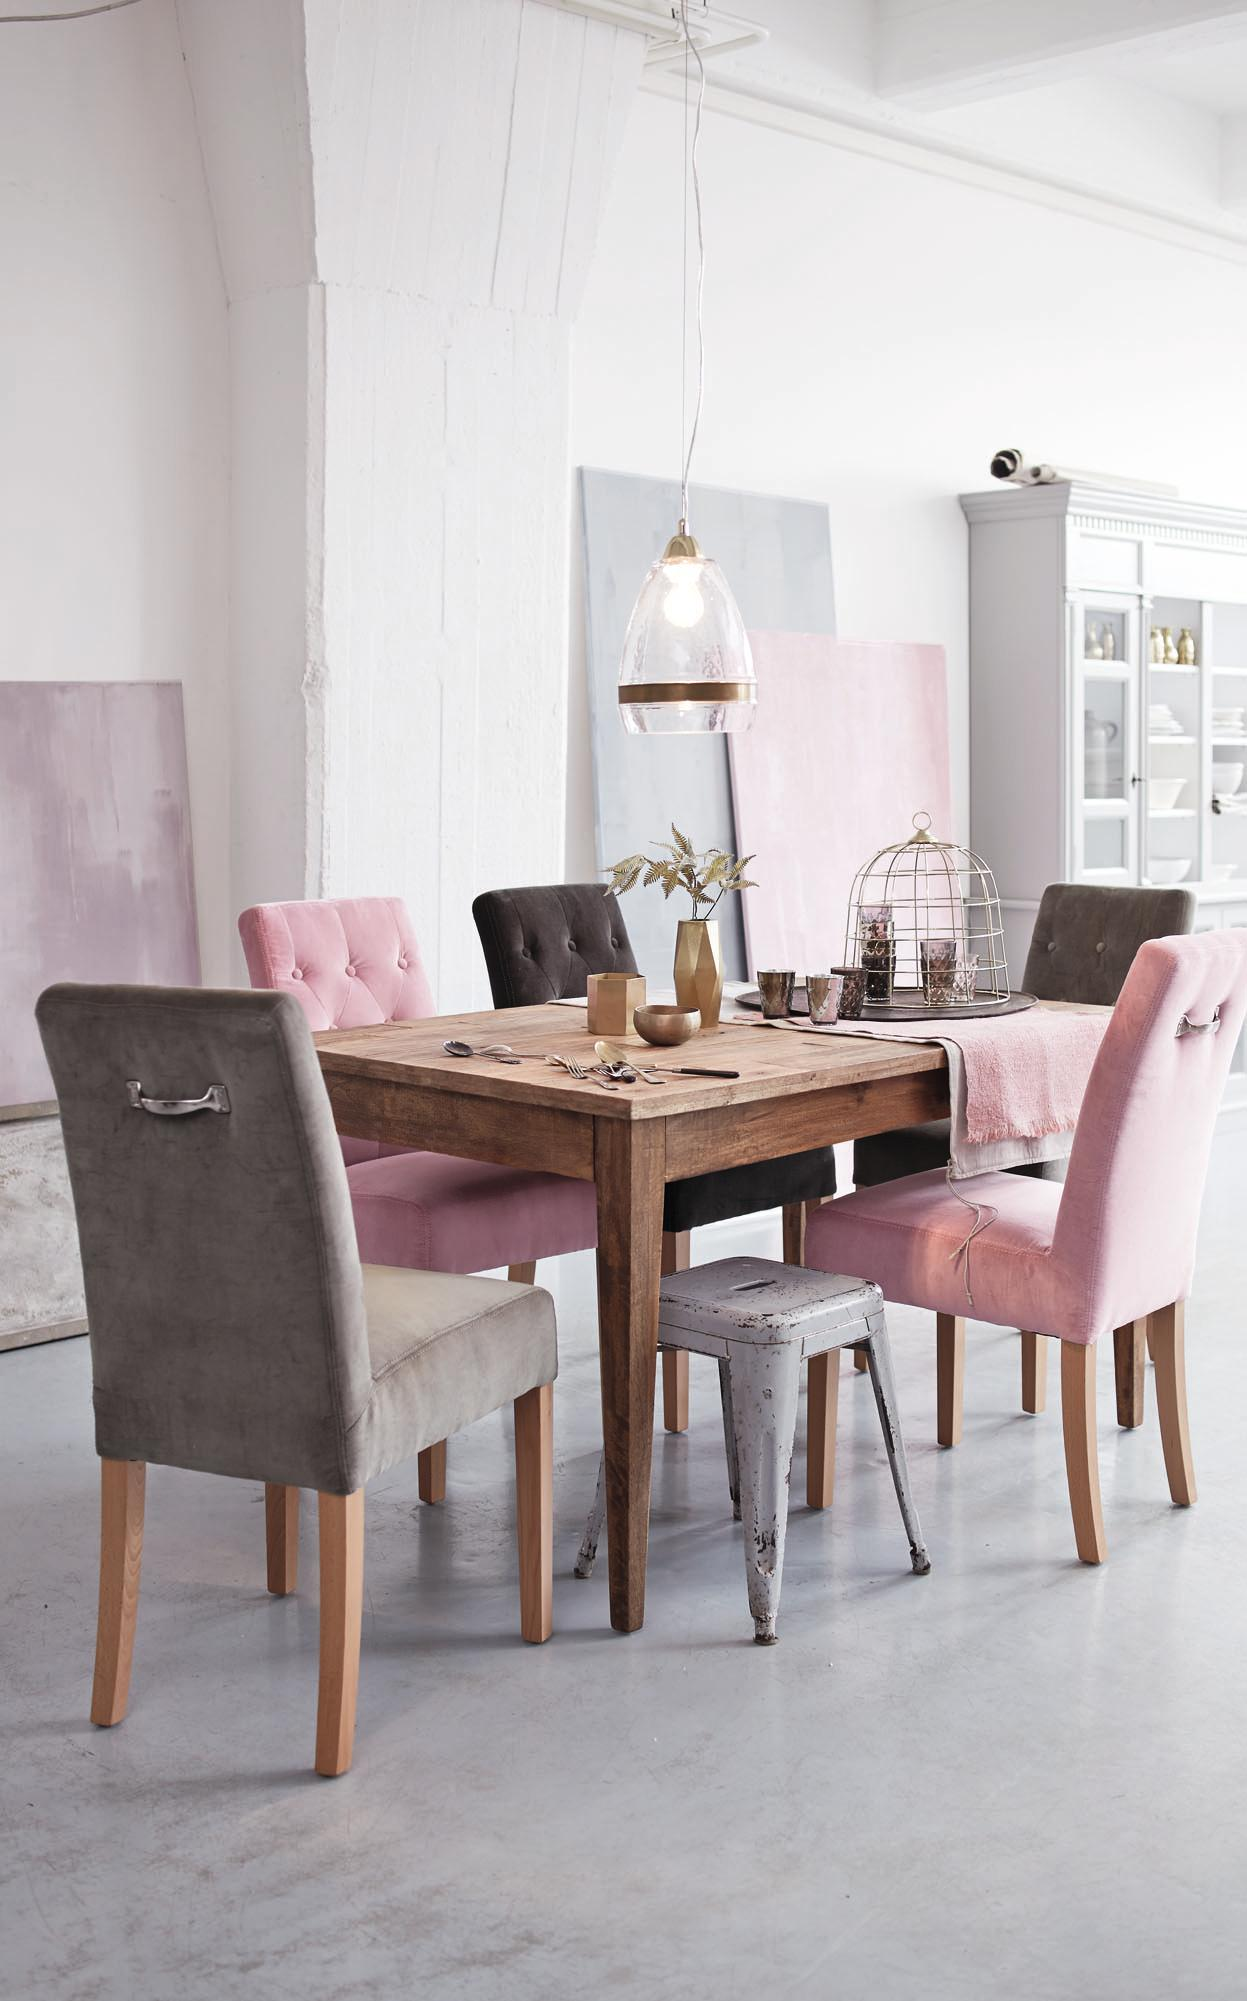 esstisch mit hocker good ikea sessel esstisch ikea sessel. Black Bedroom Furniture Sets. Home Design Ideas